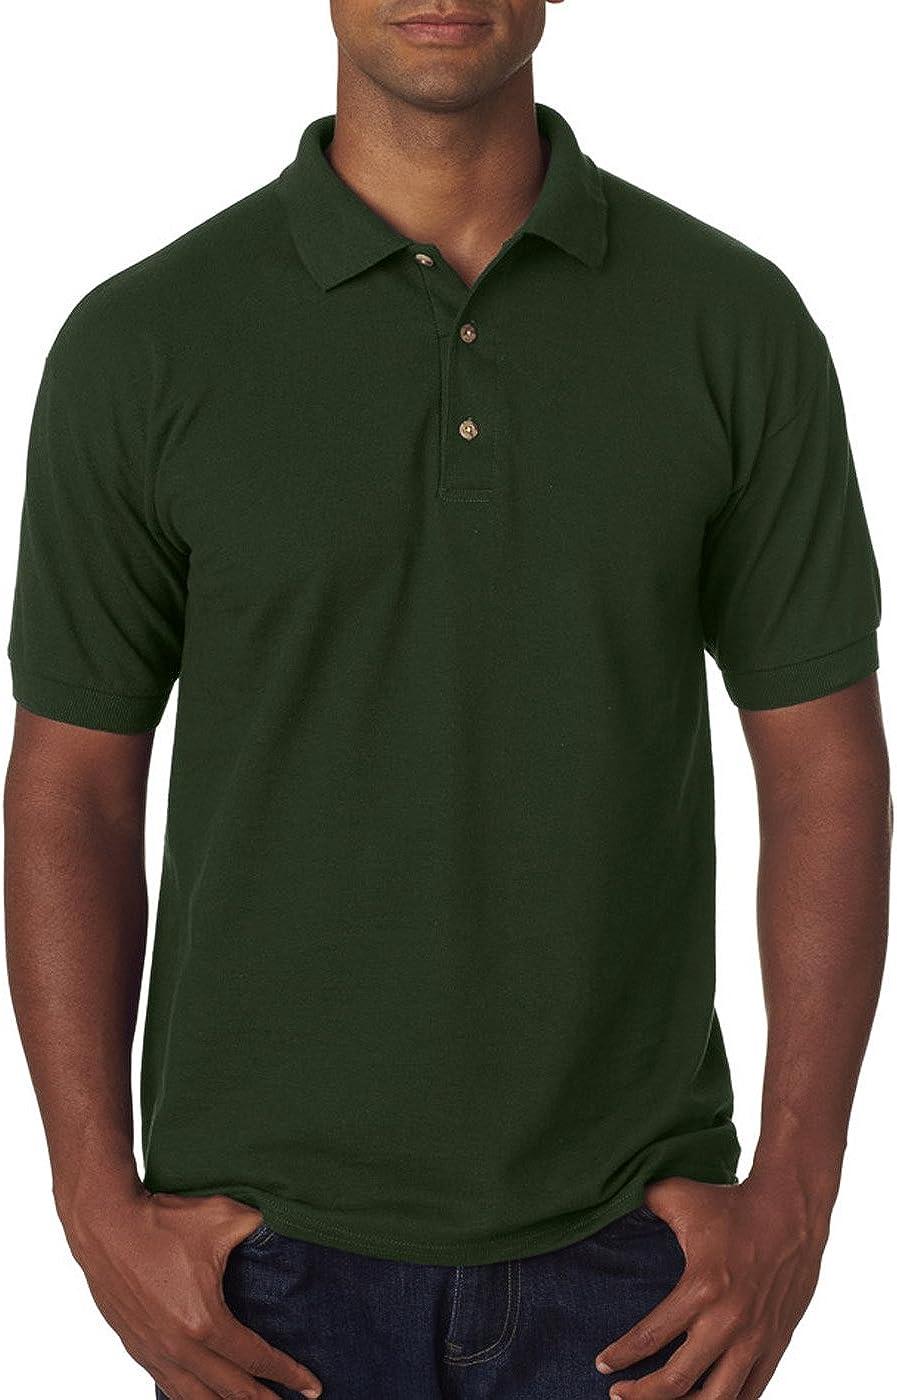 L Pique Polo Forest Green Pack of 12 Gildan Ultra Cotton 6.5 oz G380